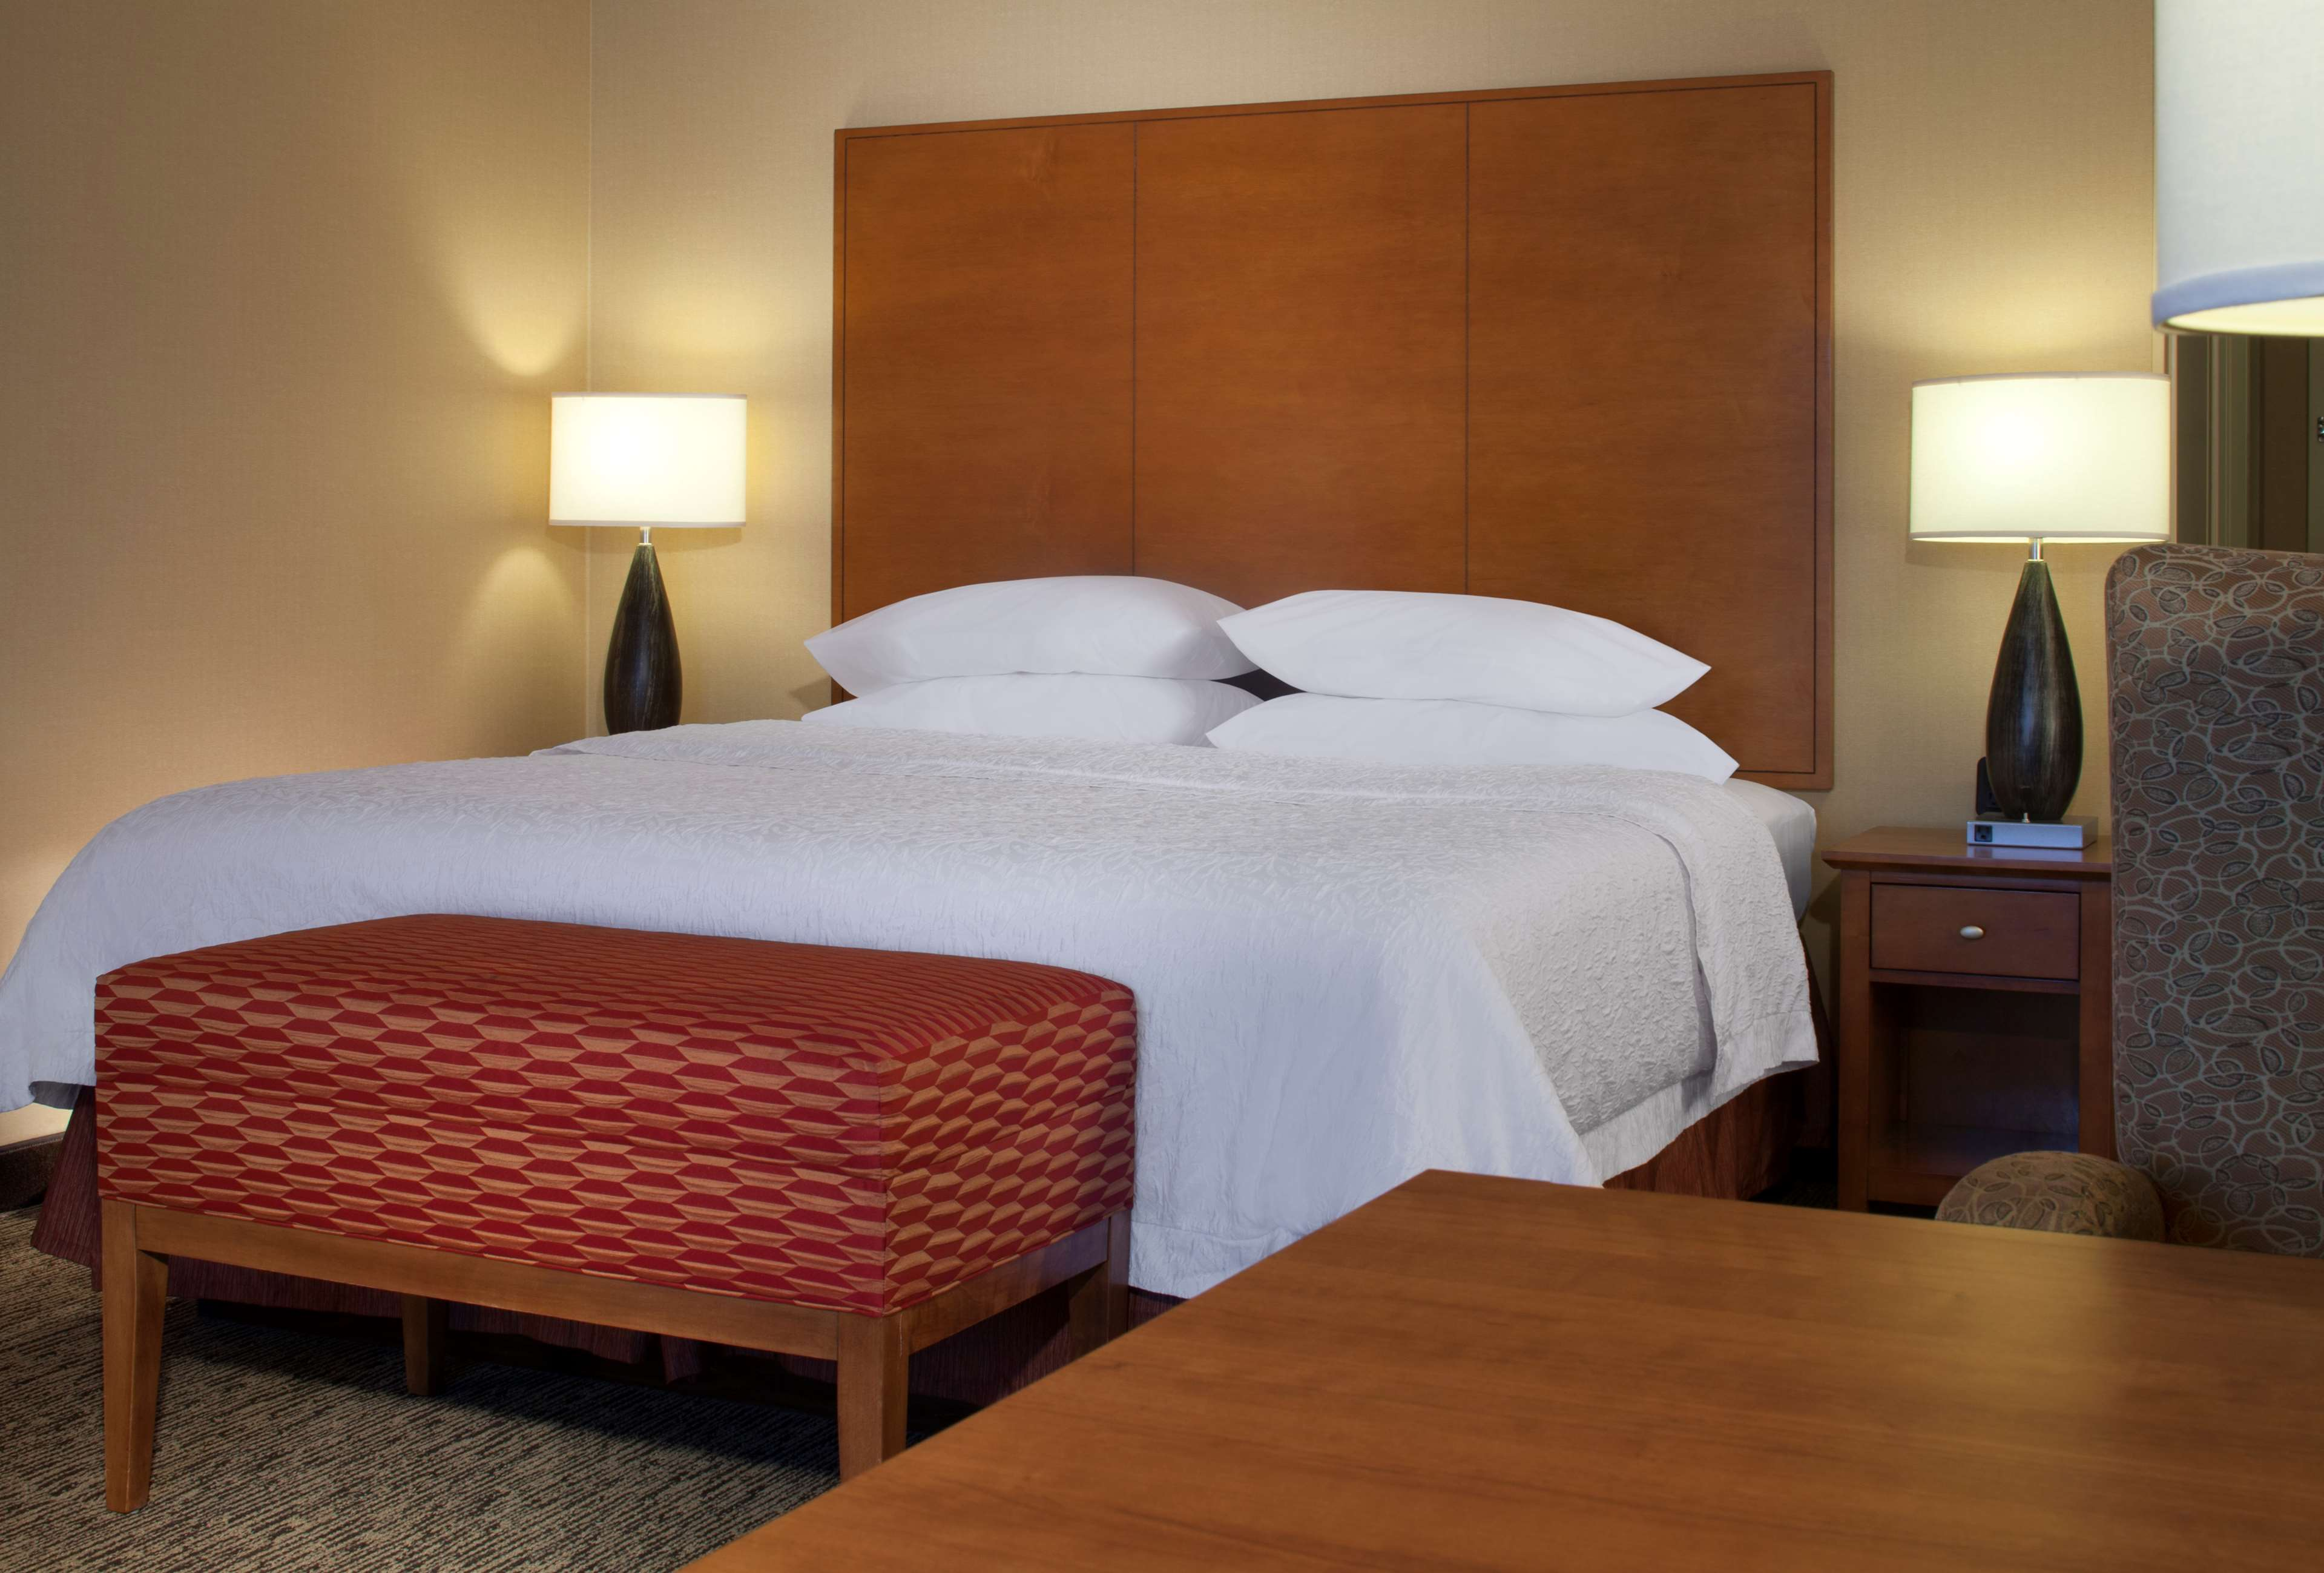 Hampton Inn & Suites Columbus-Easton Area image 30